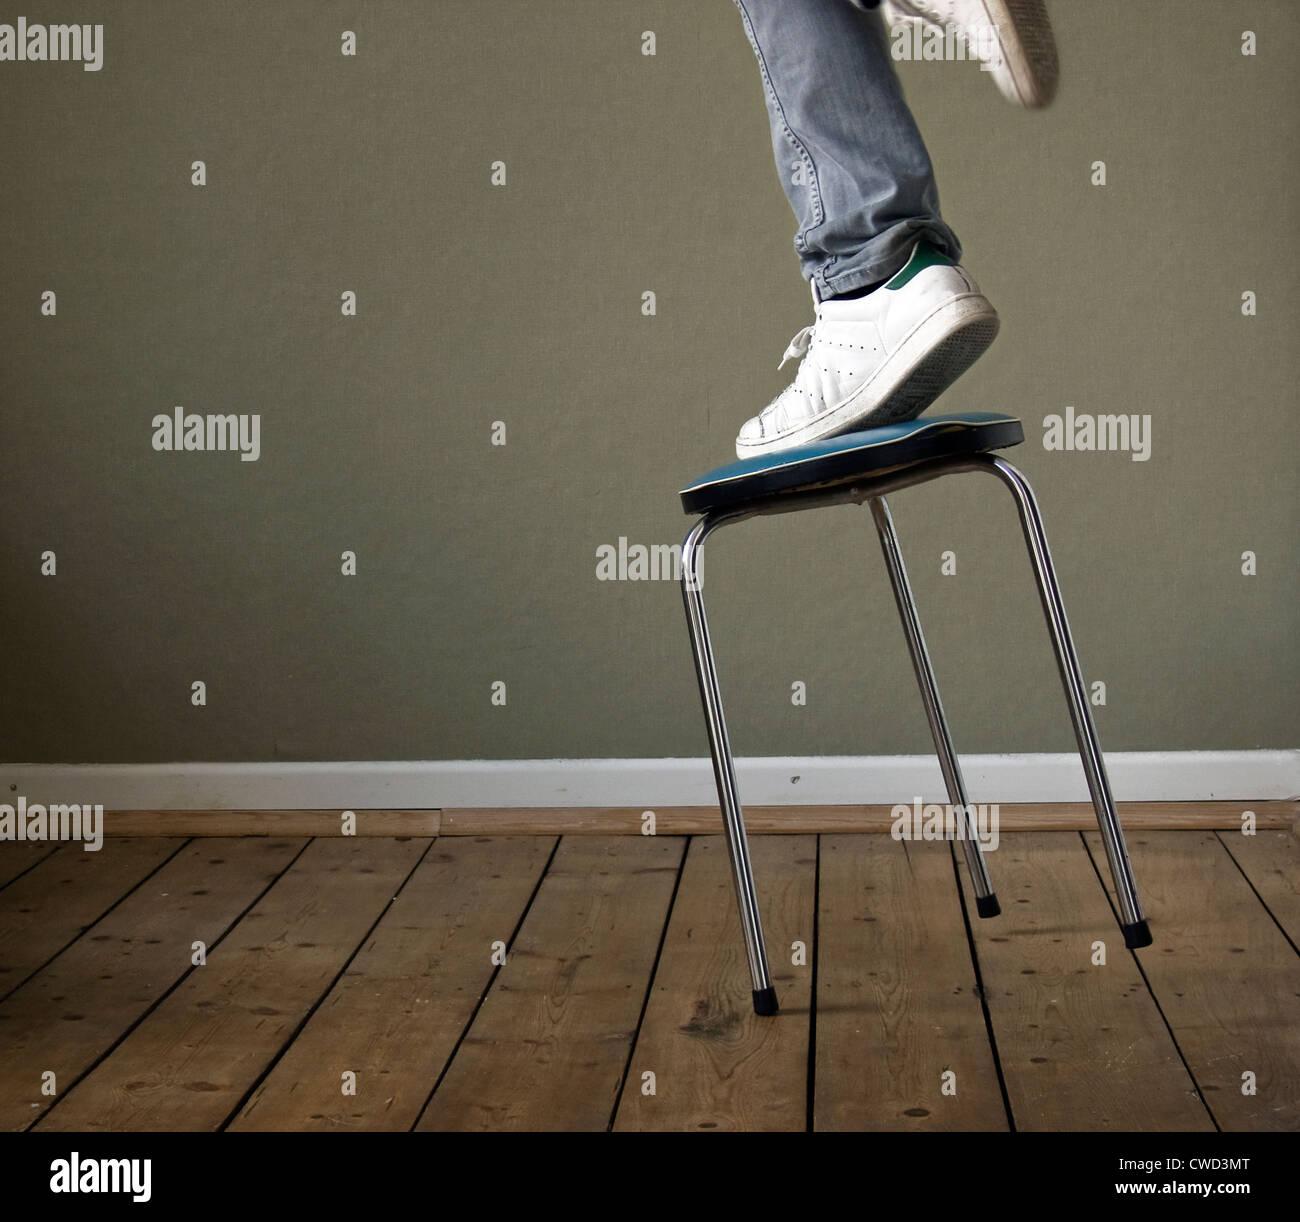 domestic life,accident,balance,fall - Stock Image